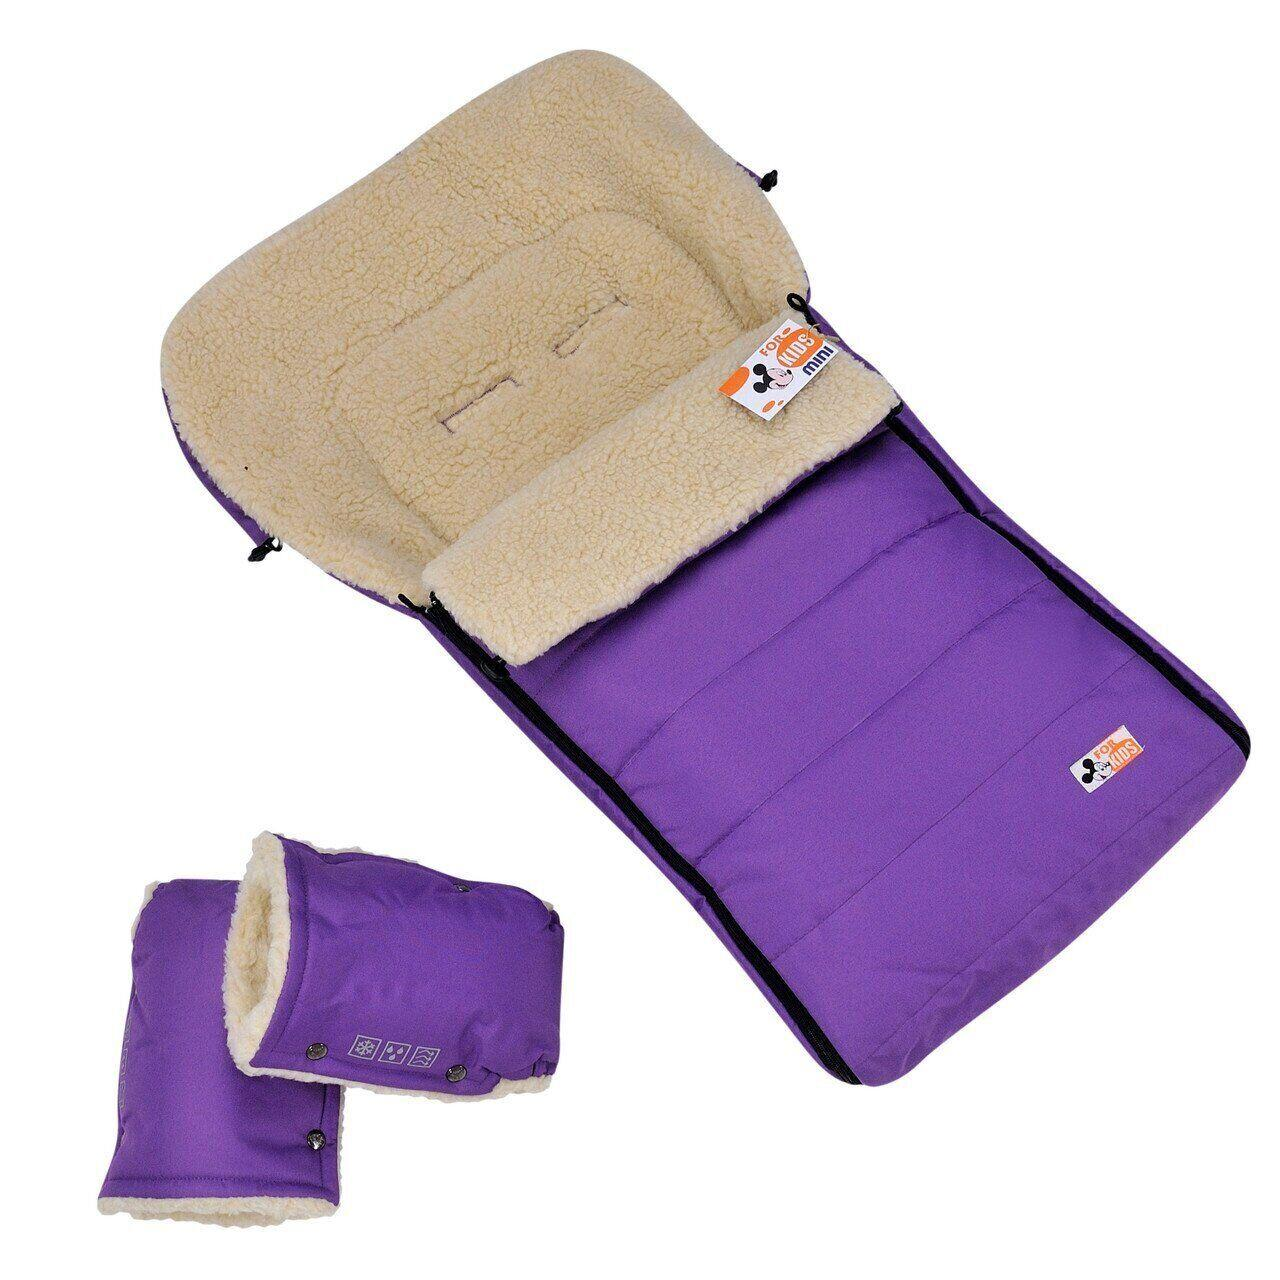 "Детский конверт на овчине 70/30 с рукавичками ""For kids"" Mini фиолетовый"